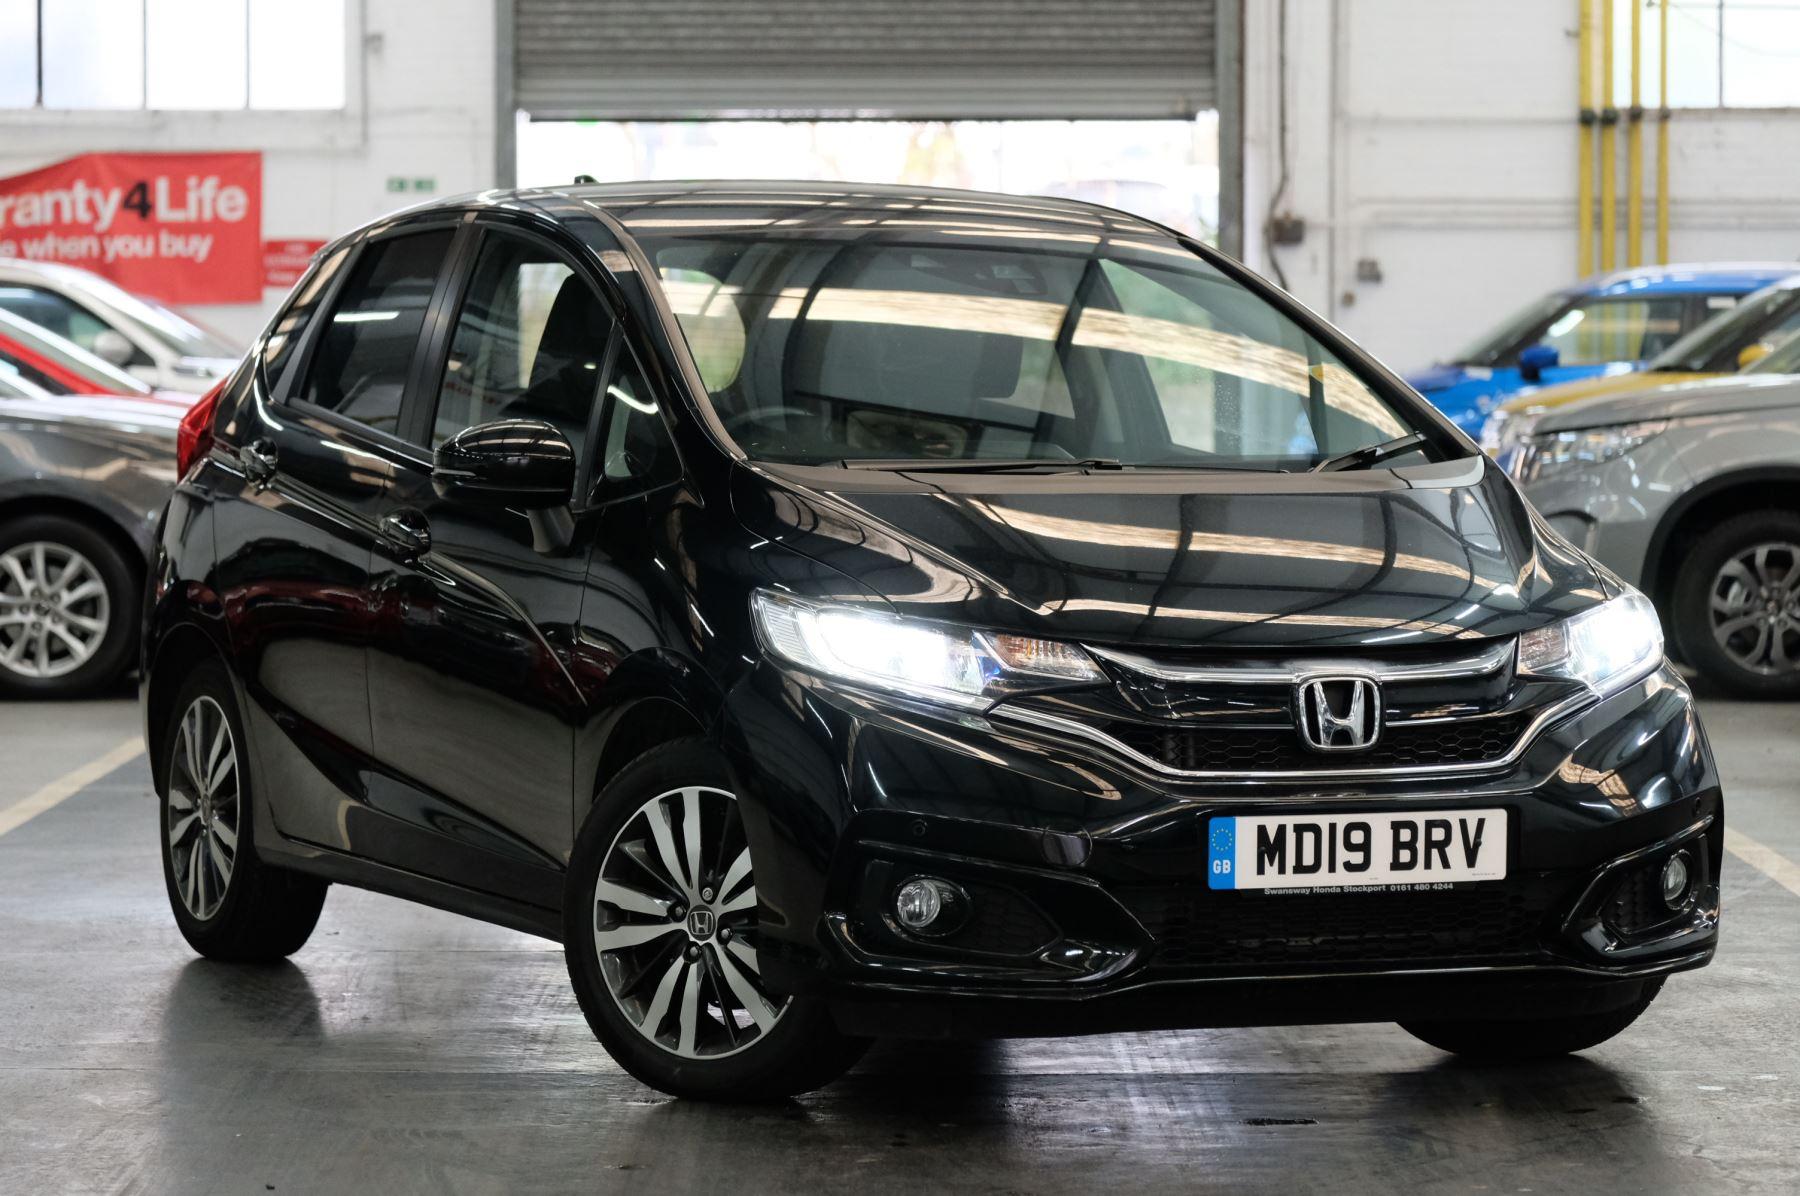 Honda Jazz 1.3 i-VTEC EX CVT Automatic 5 door Hatchback (2019) image